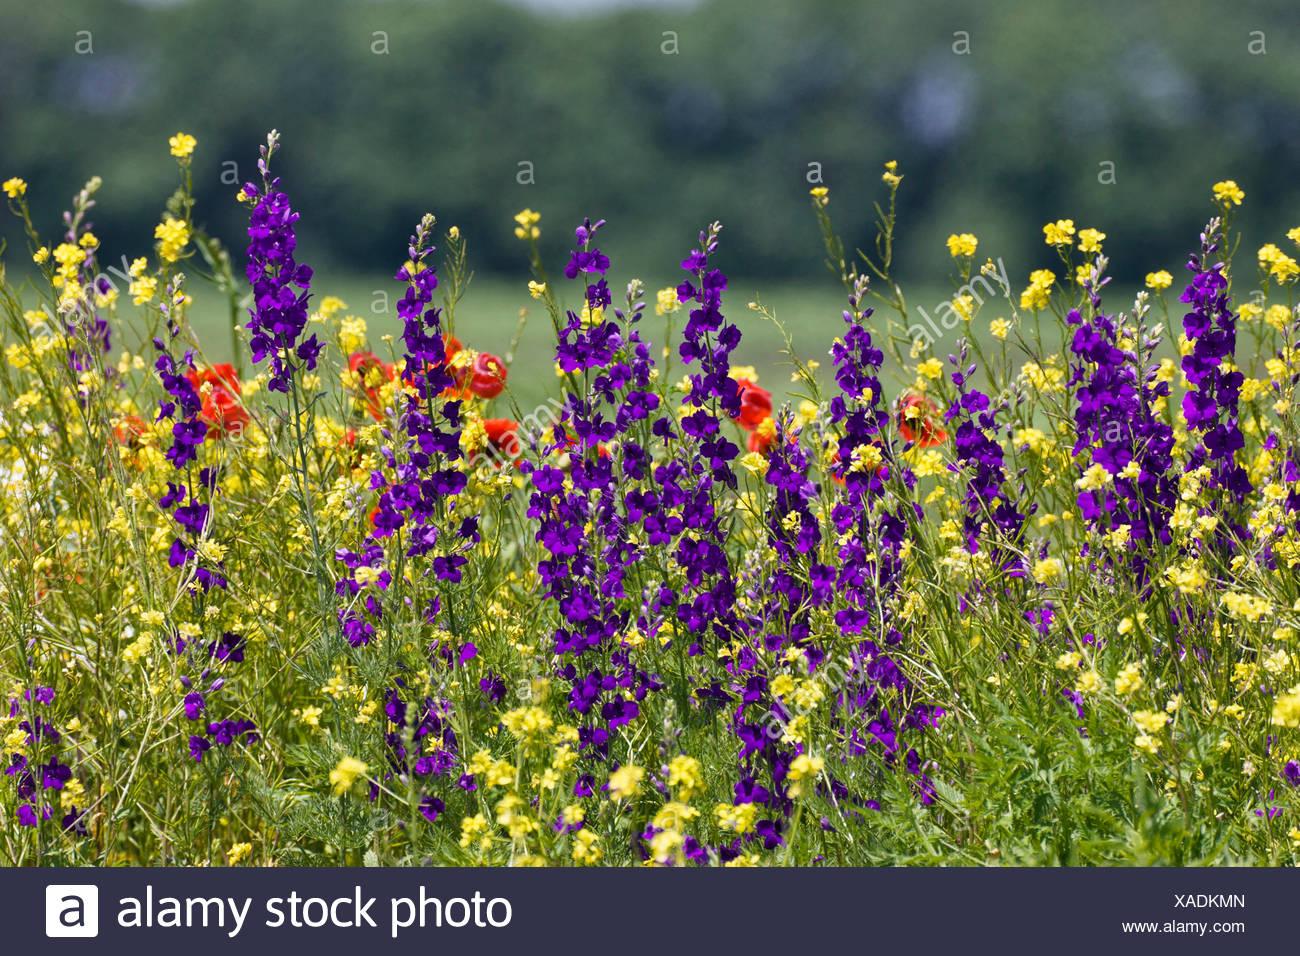 Doubtful knight's-spur, Larkspur, Annual Delphinium (Consolida ajacis, Delphinium ajacis), flowering meadow with Consolida ambigua, Bulgaria - Stock Image